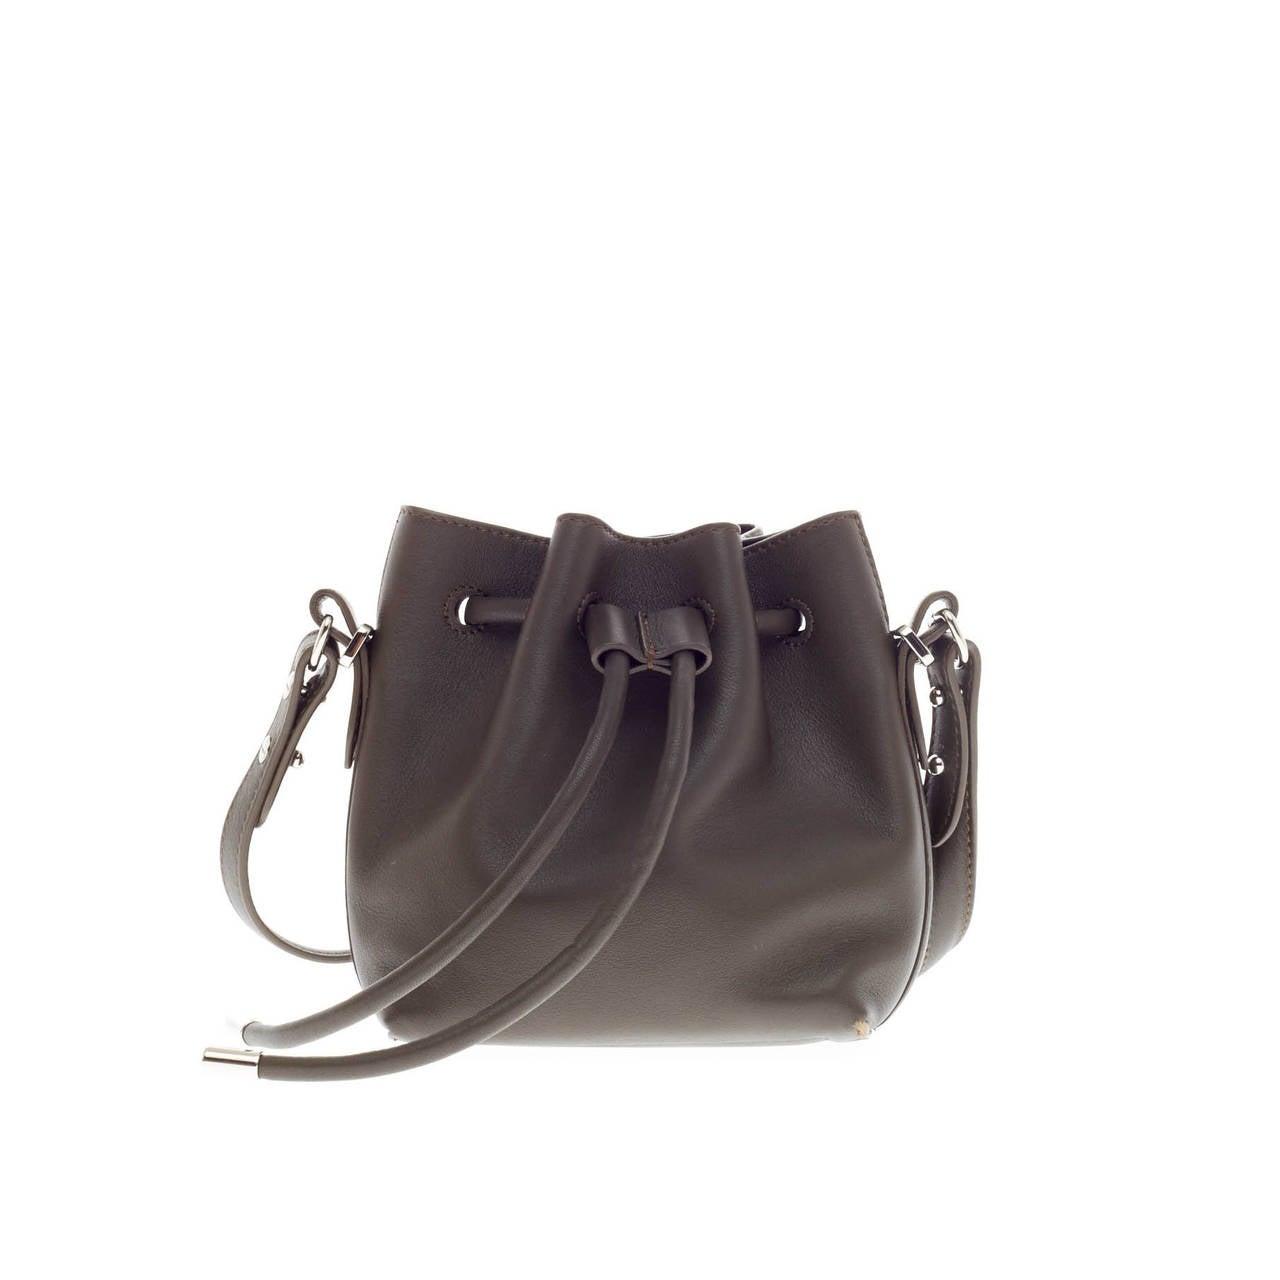 Proenza Schouler Bucket Bag Leather Tiny 1